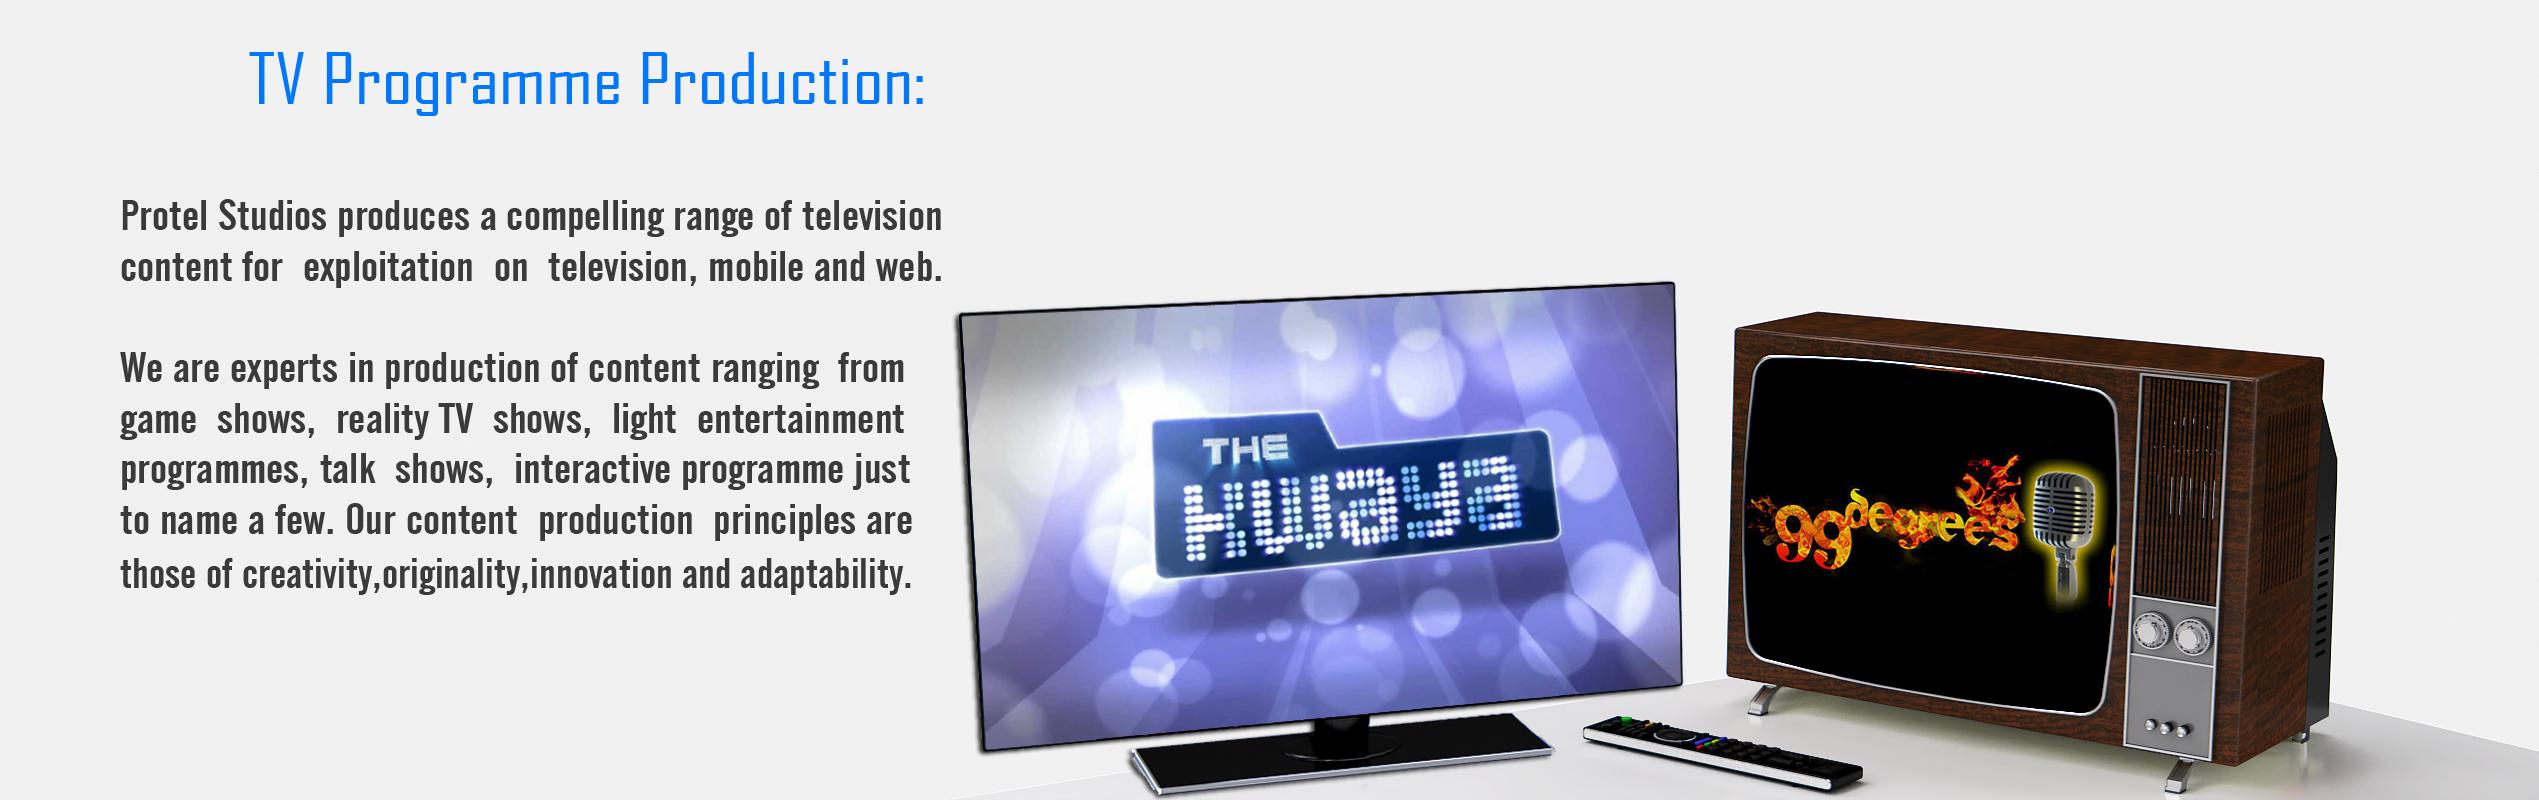 TV Programme Production X